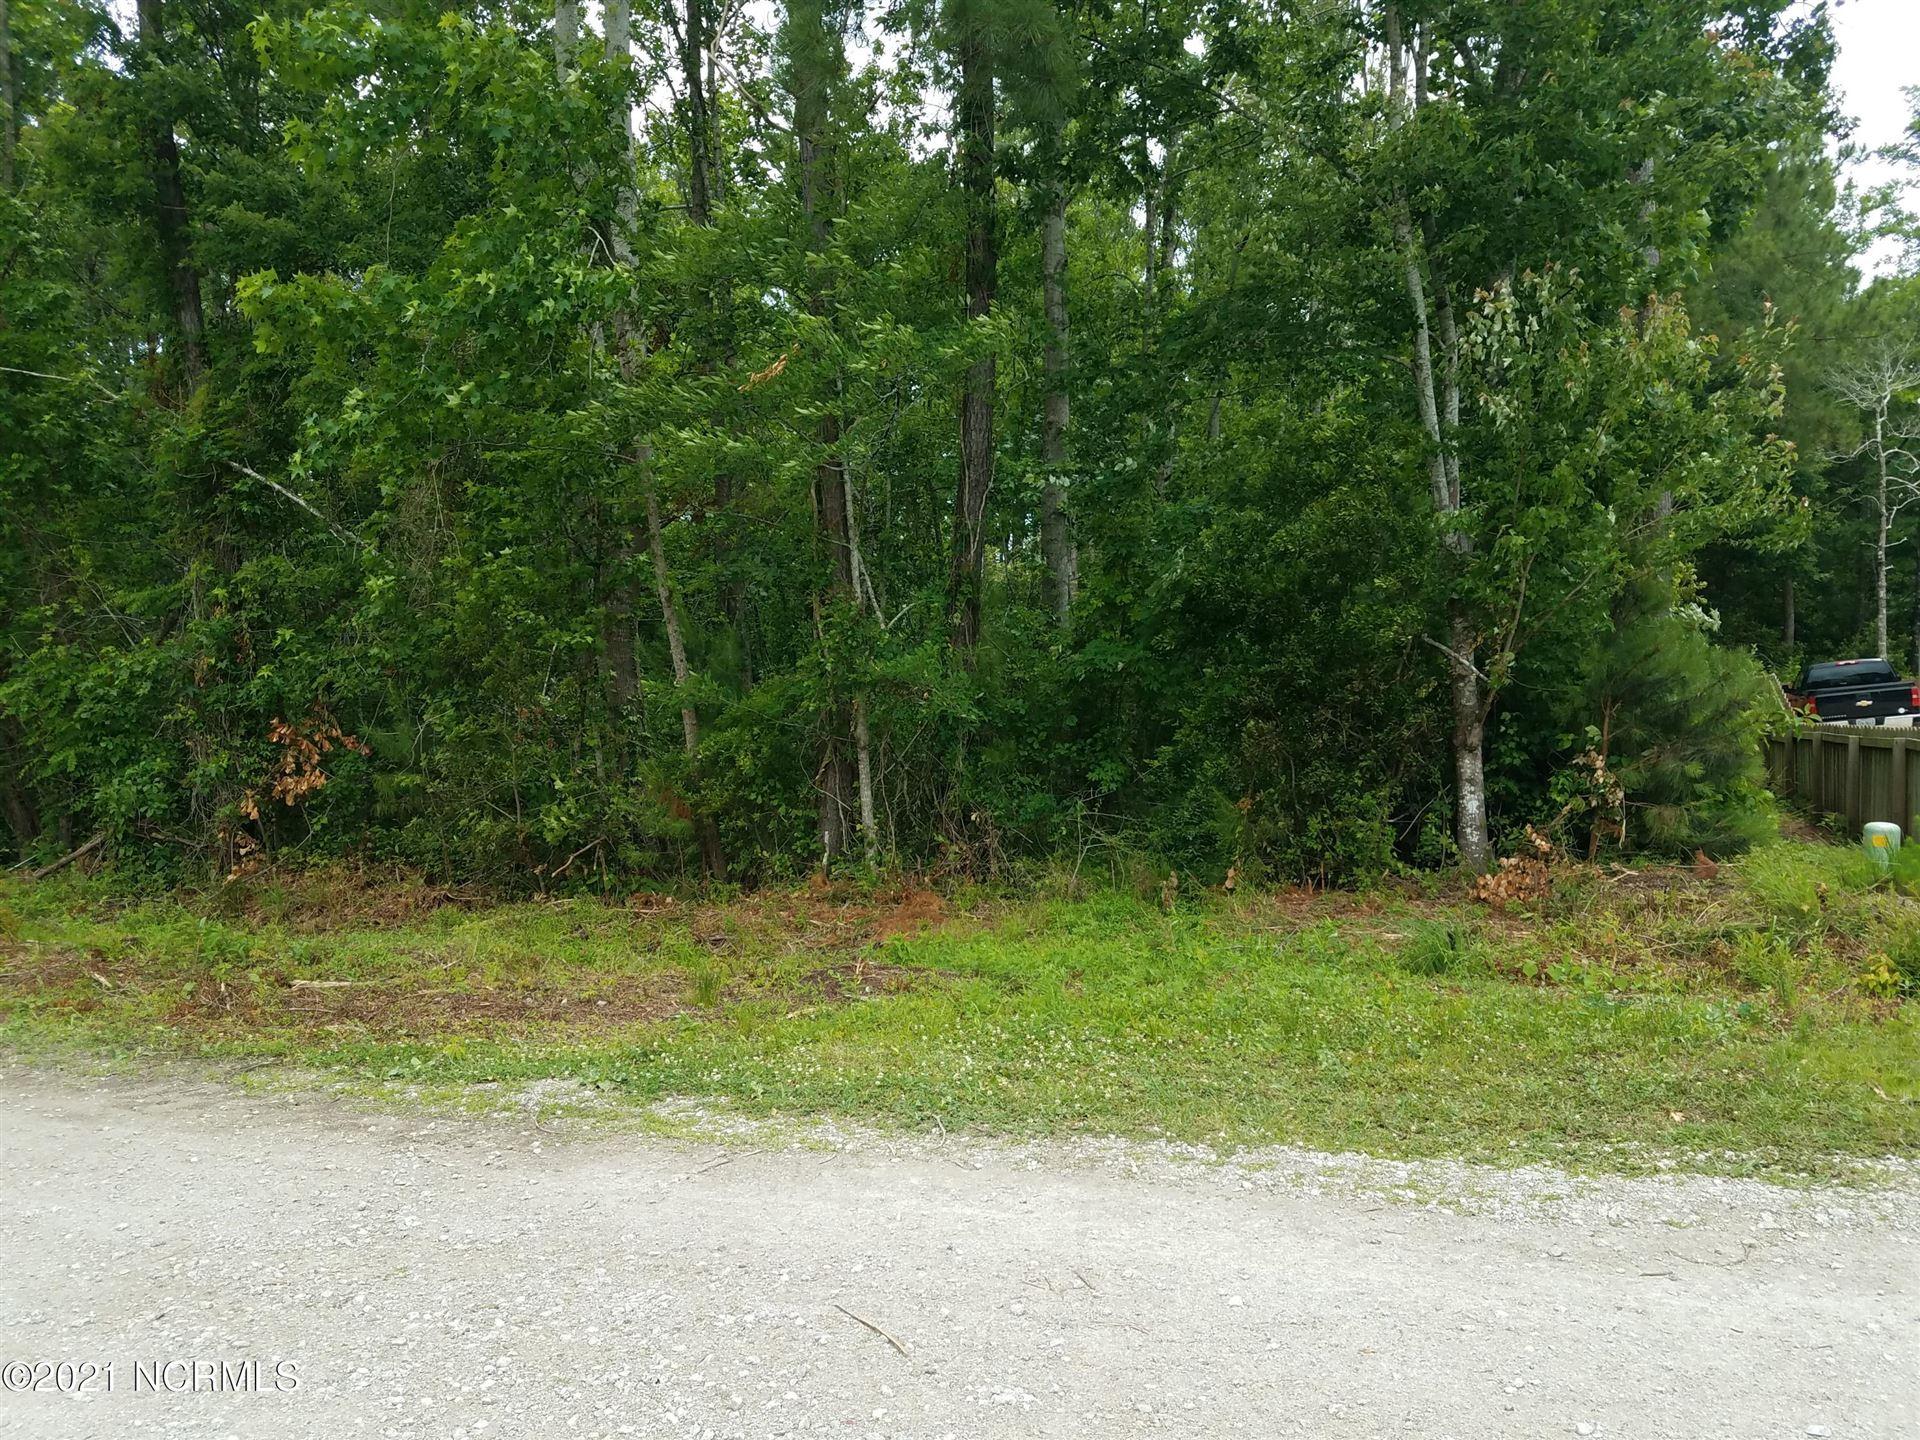 Photo of 37 Doral Drive, Hampstead, NC 28443 (MLS # 100274634)